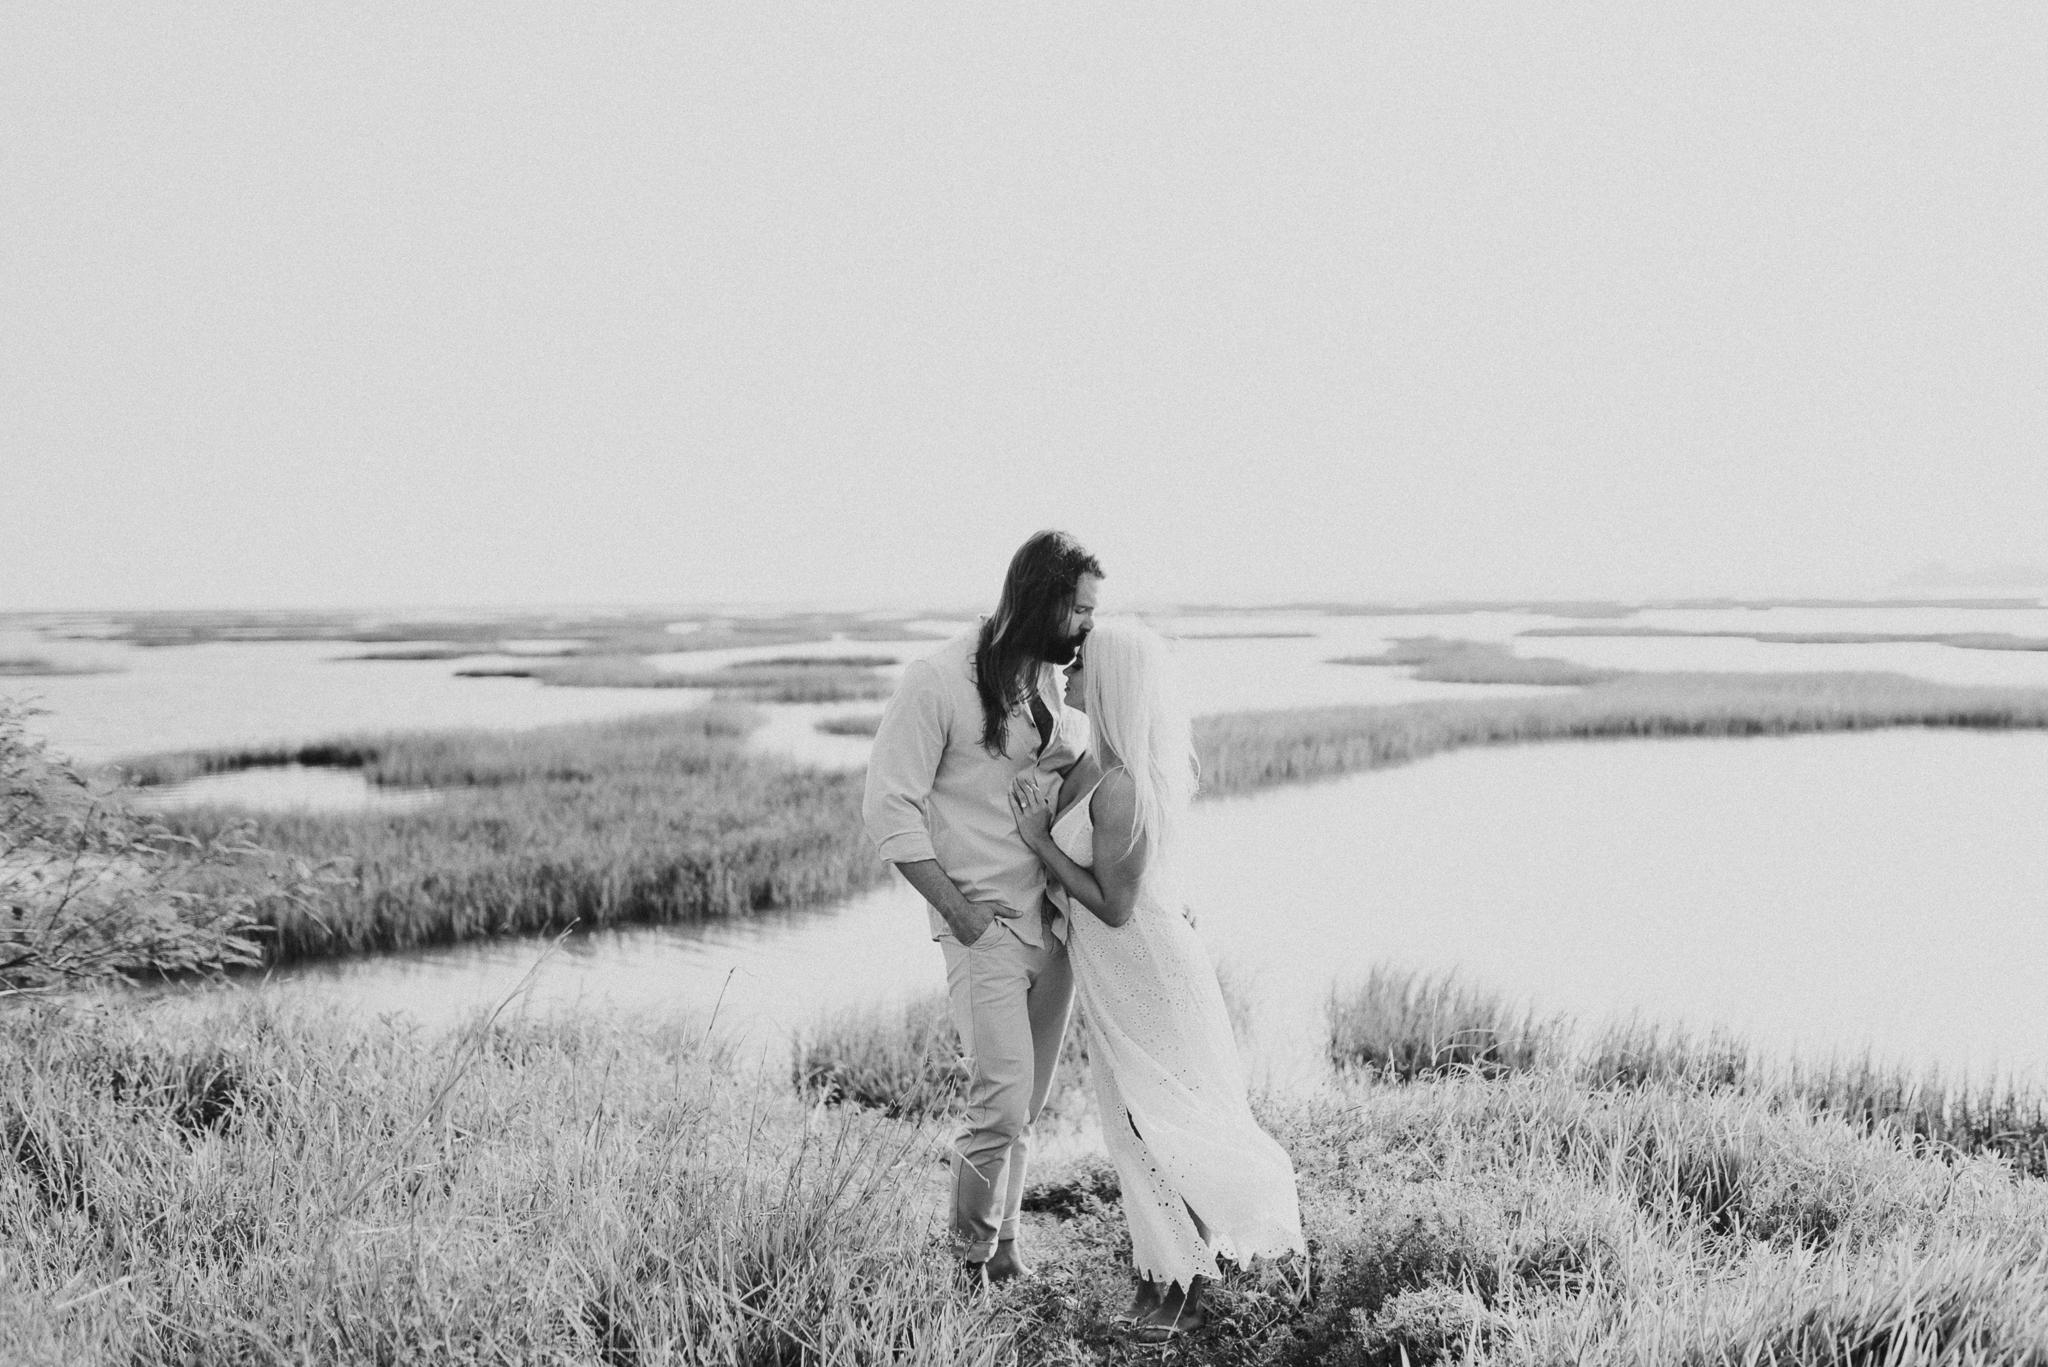 Ashley + Charles - Galveston Texas Moody Engagement Session | Kristen Giles Photography - 004.jpg